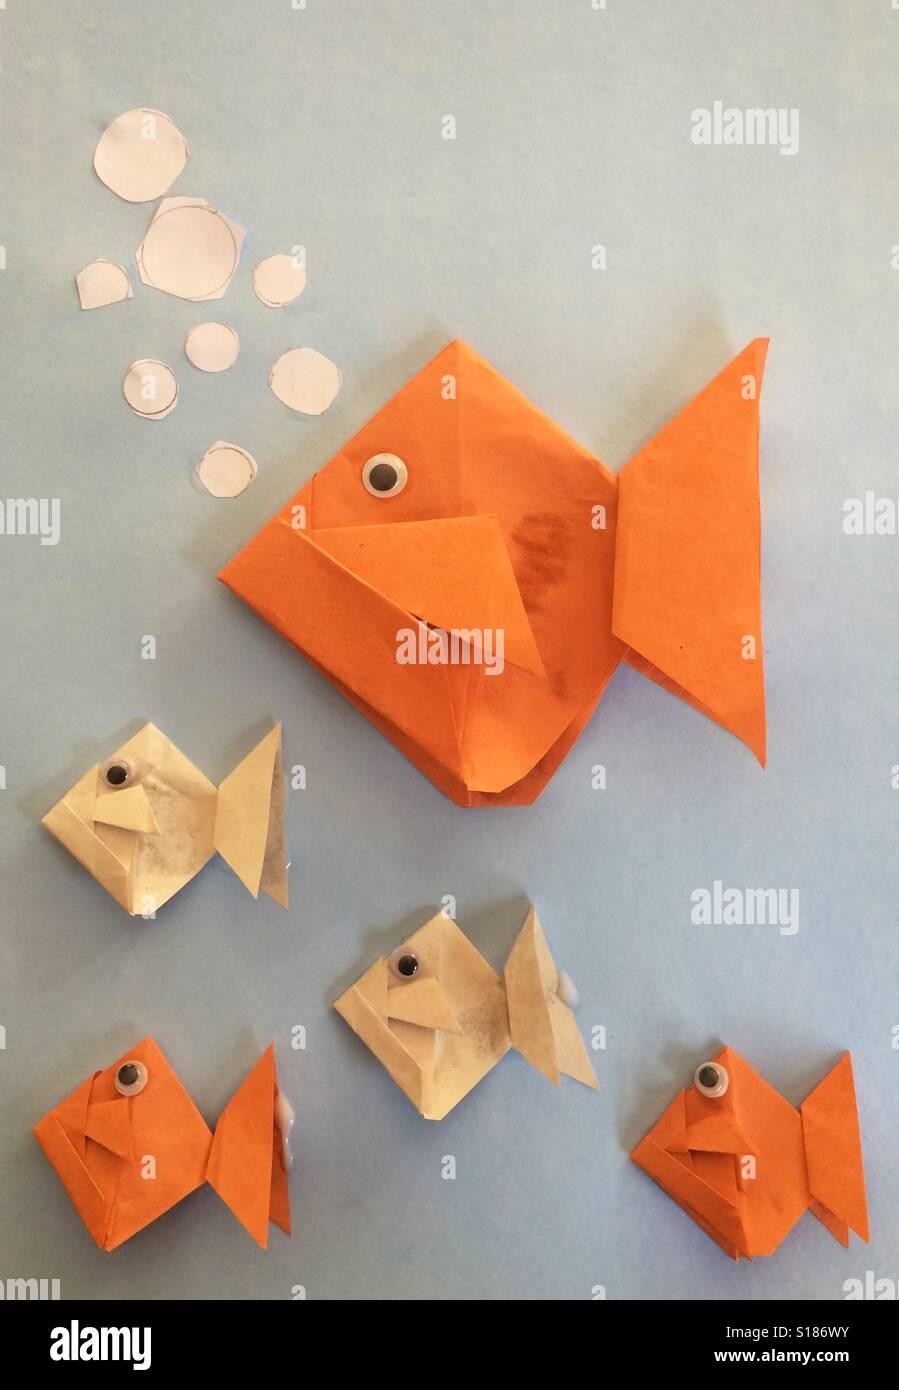 Origami Di Pesce Foto Immagine Stock 310582327 Alamy